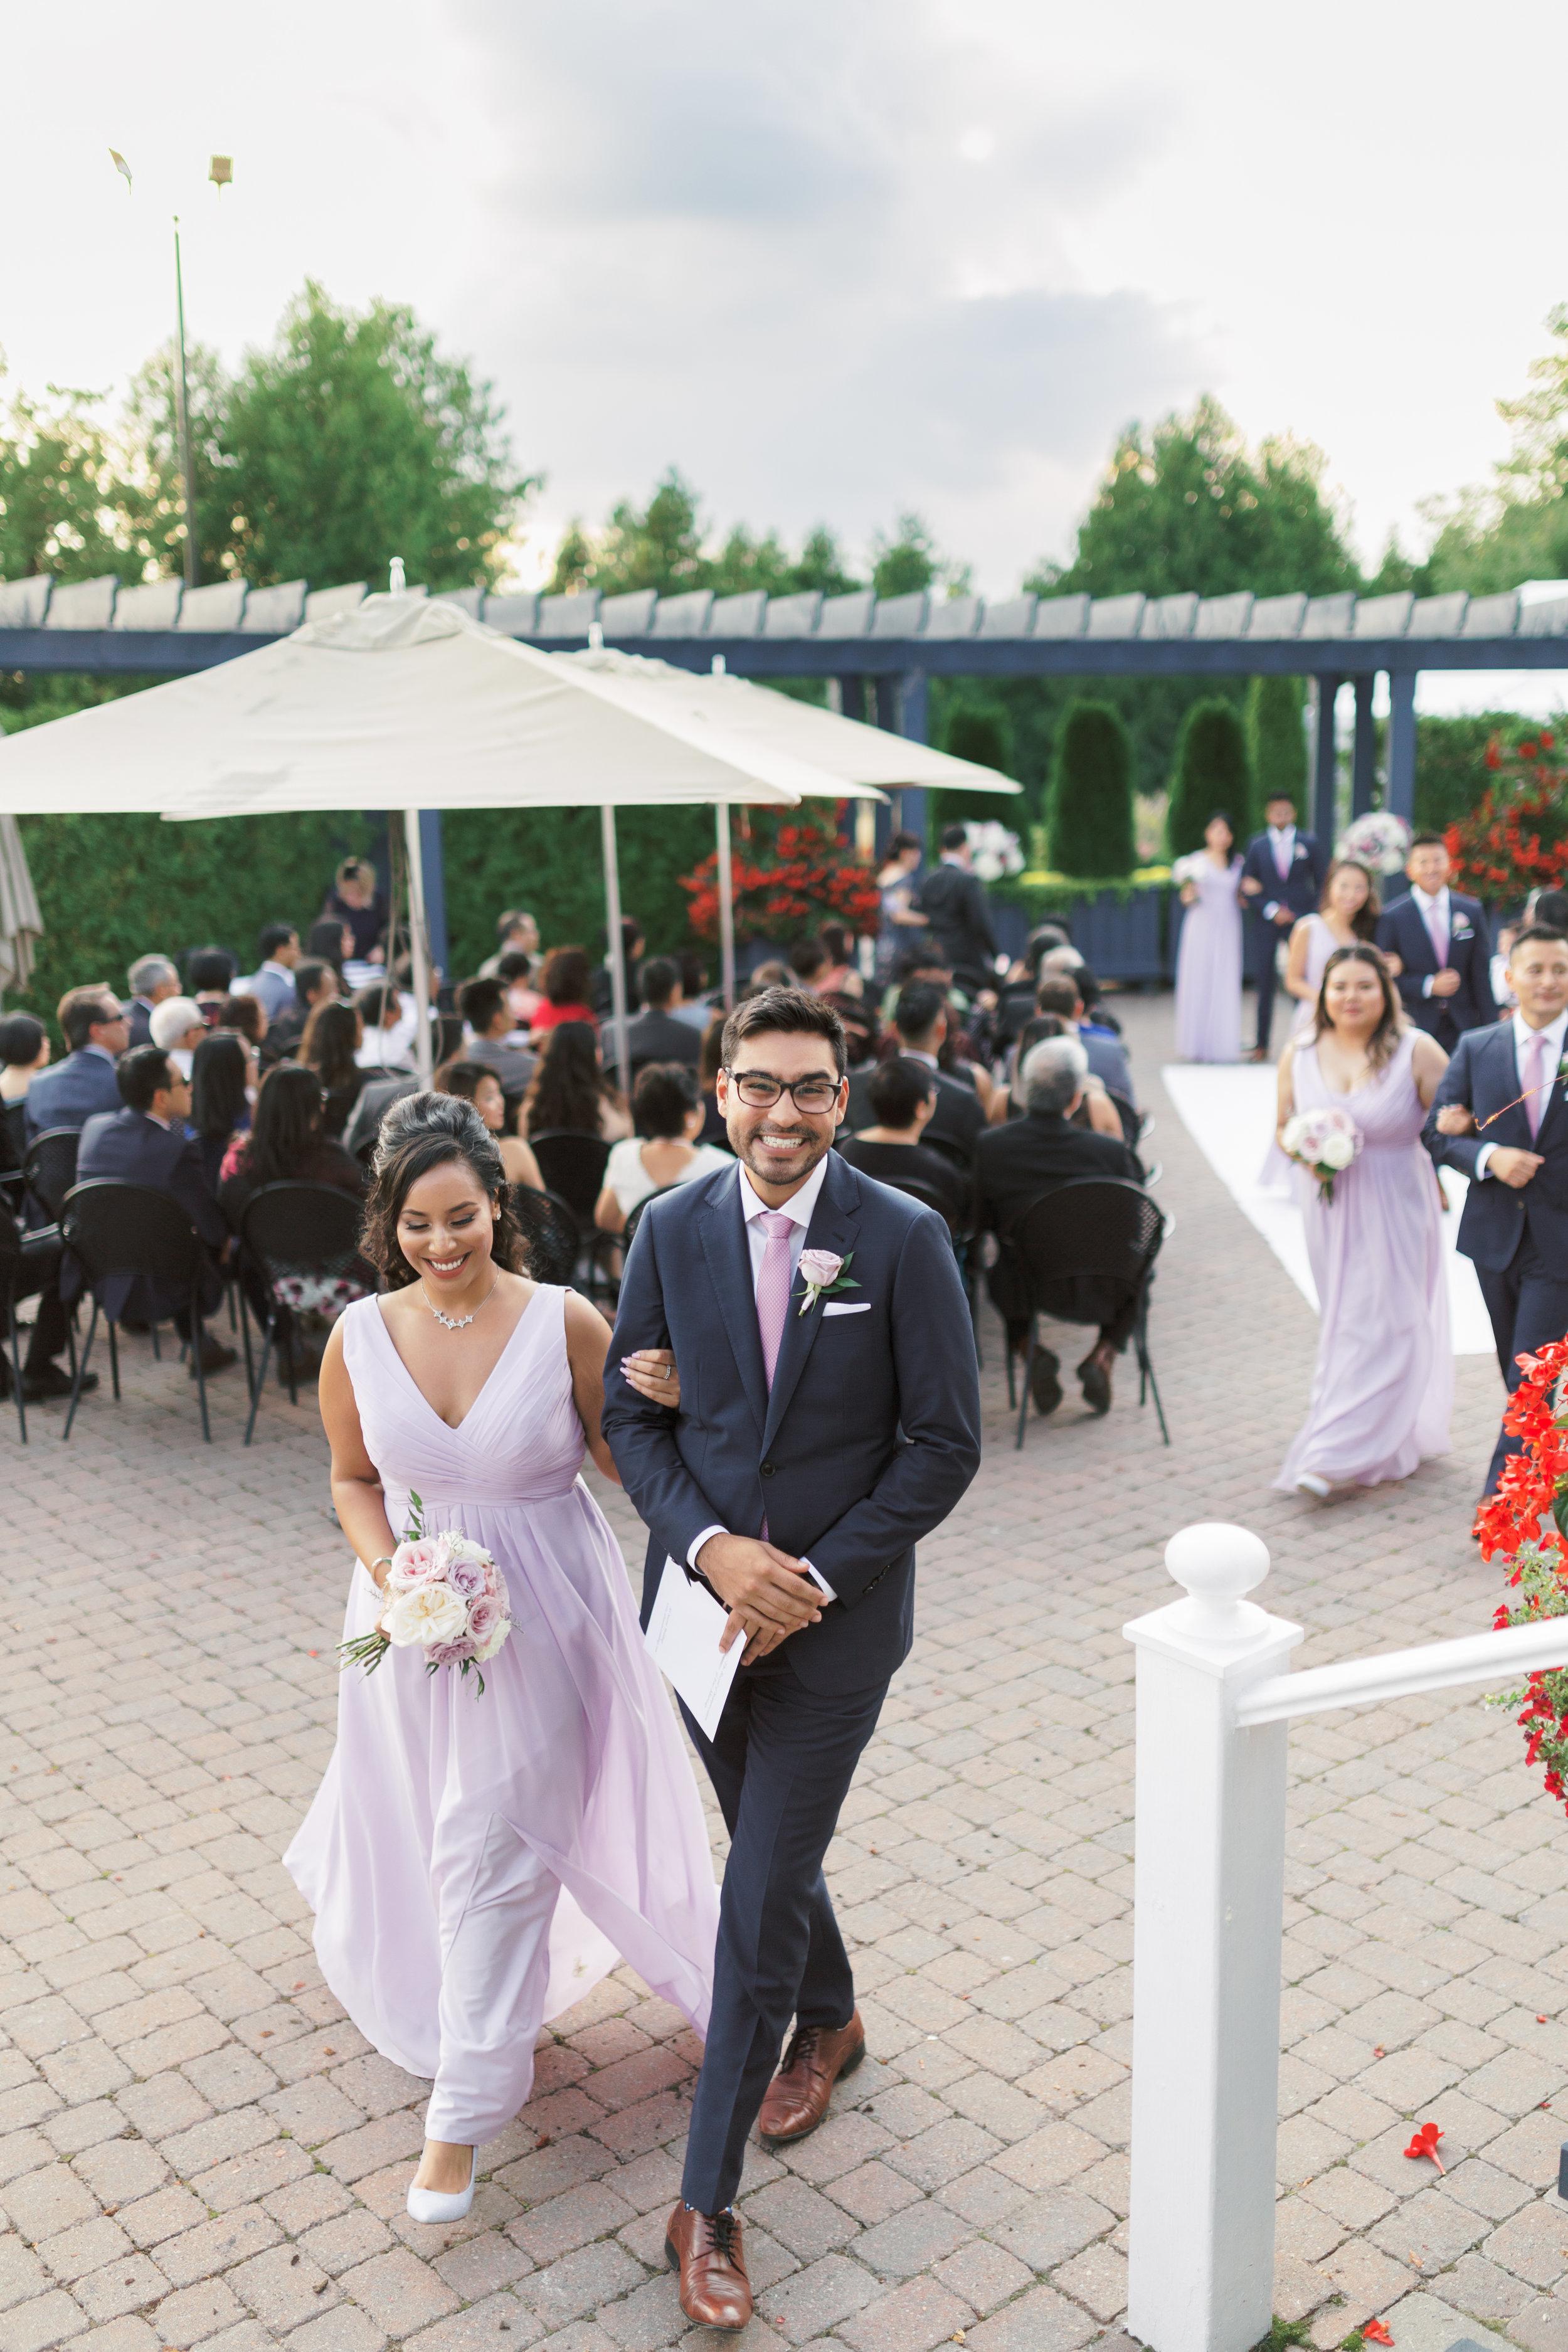 Angus Glen Wedding - Ceremony-106.jpg